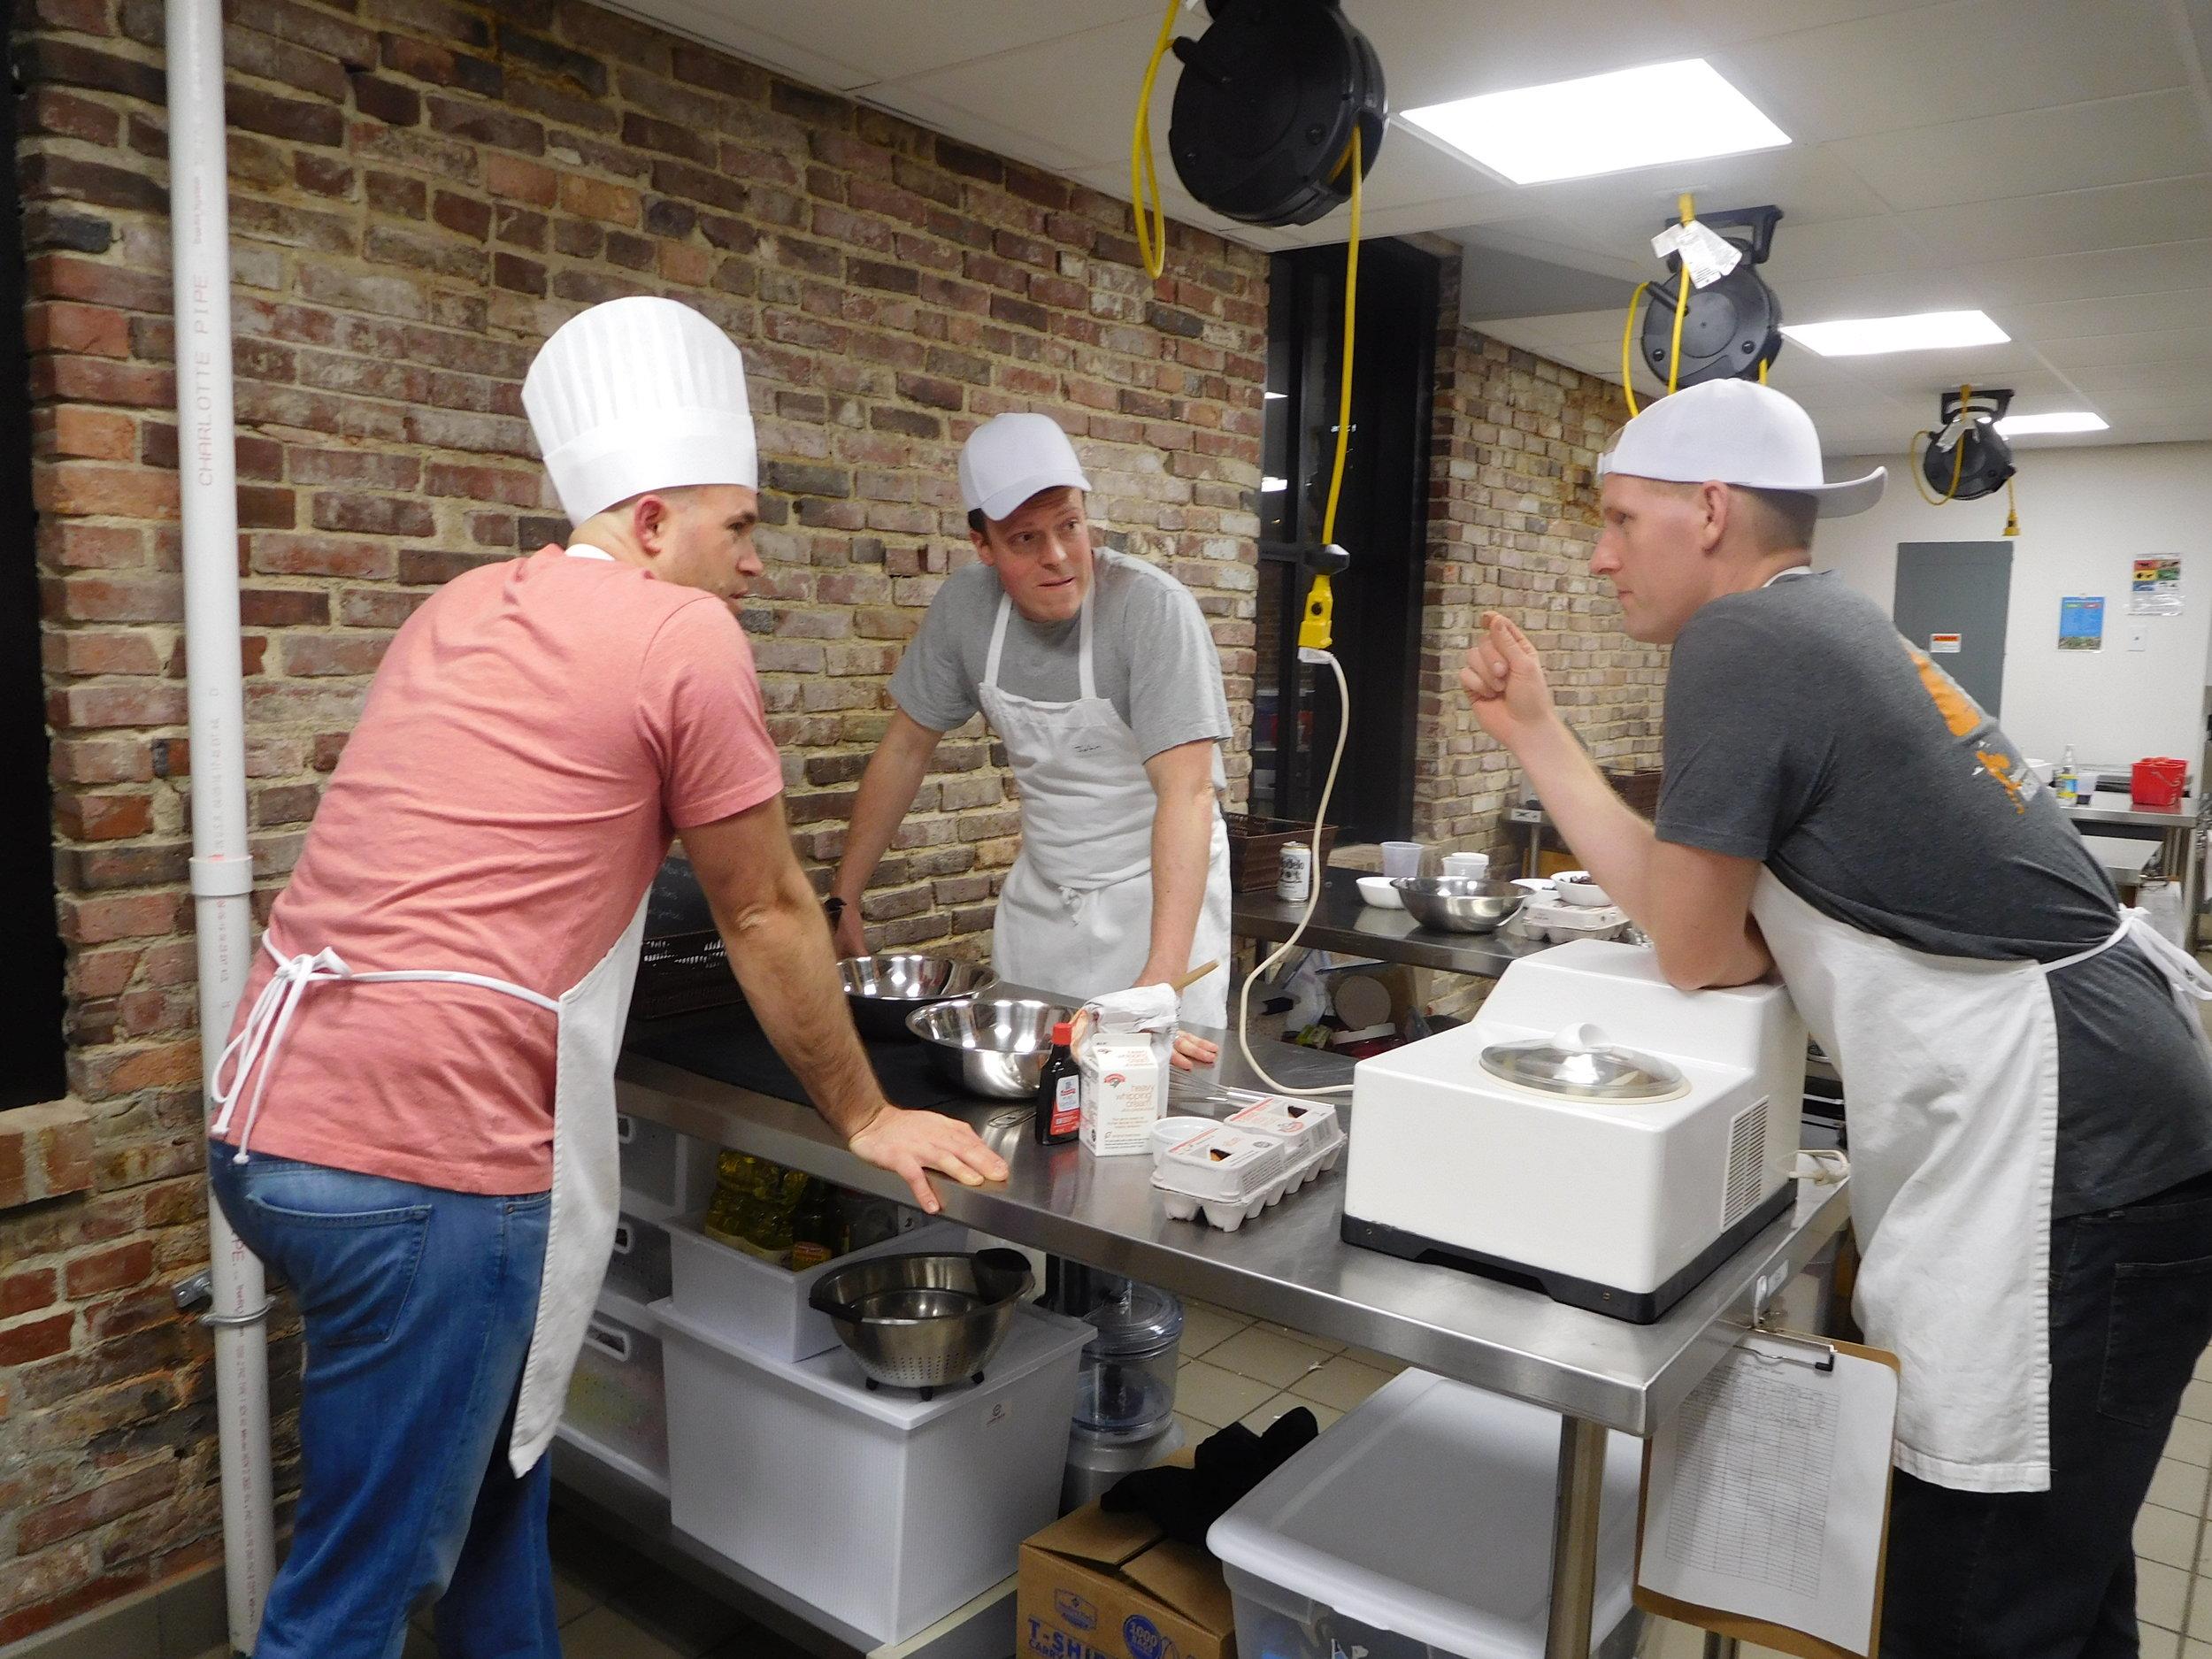 Amateur cooks brainstorming with ice cream machine